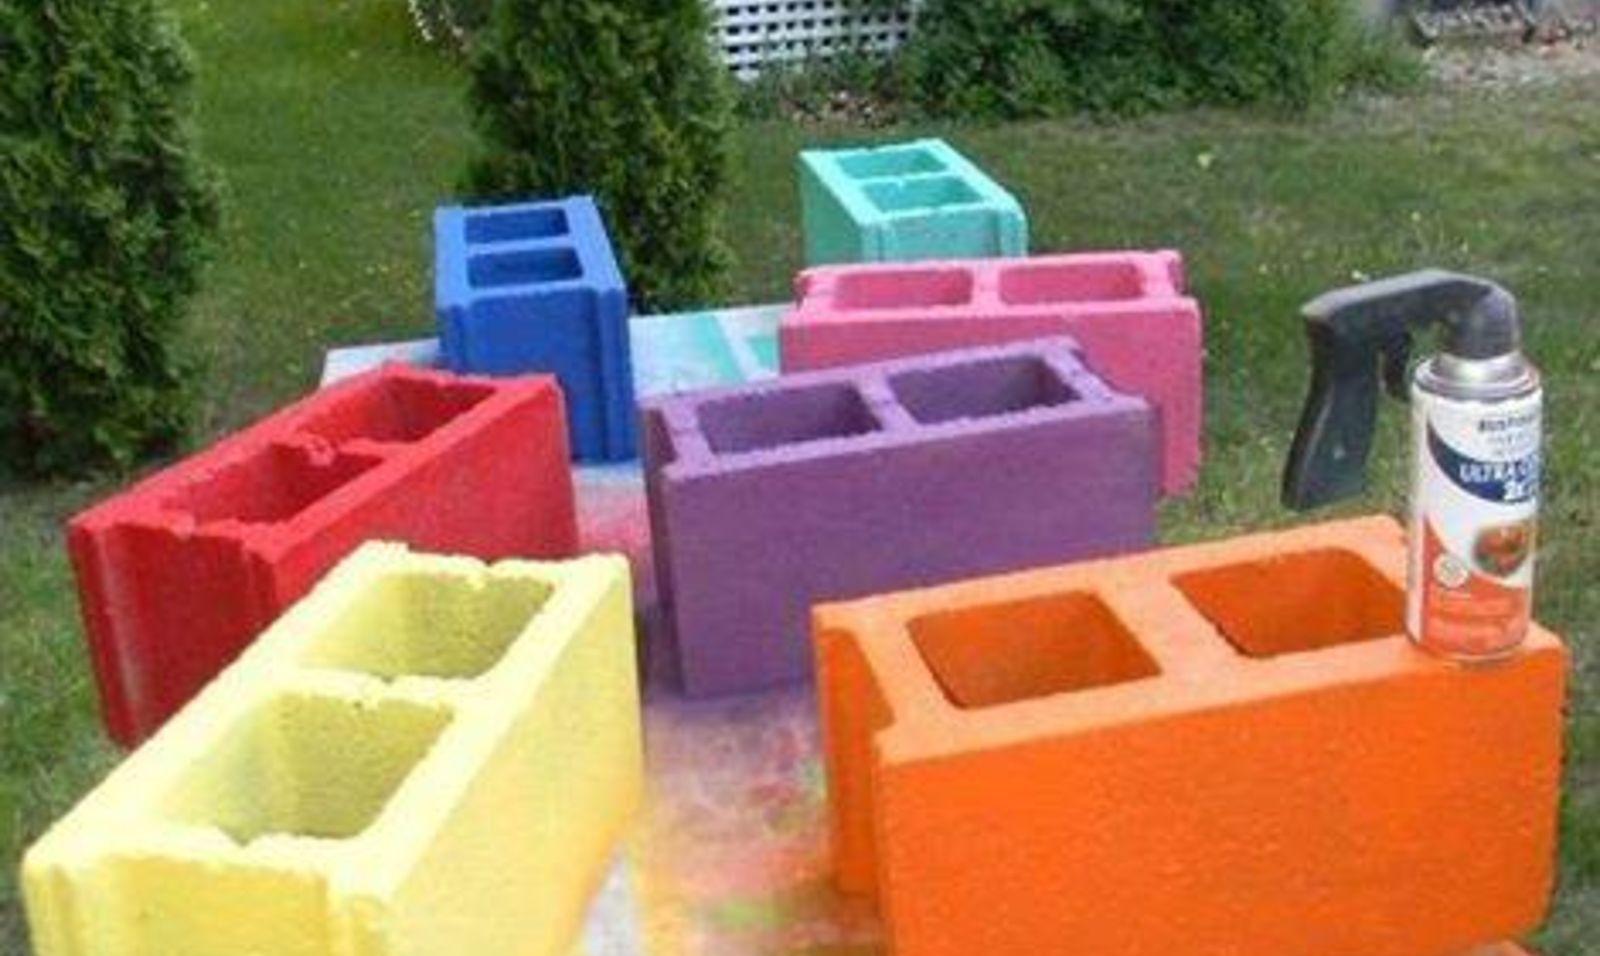 10 genius ways to use cinder blocks in your garden hometalk for Painting cinder blocks for garden